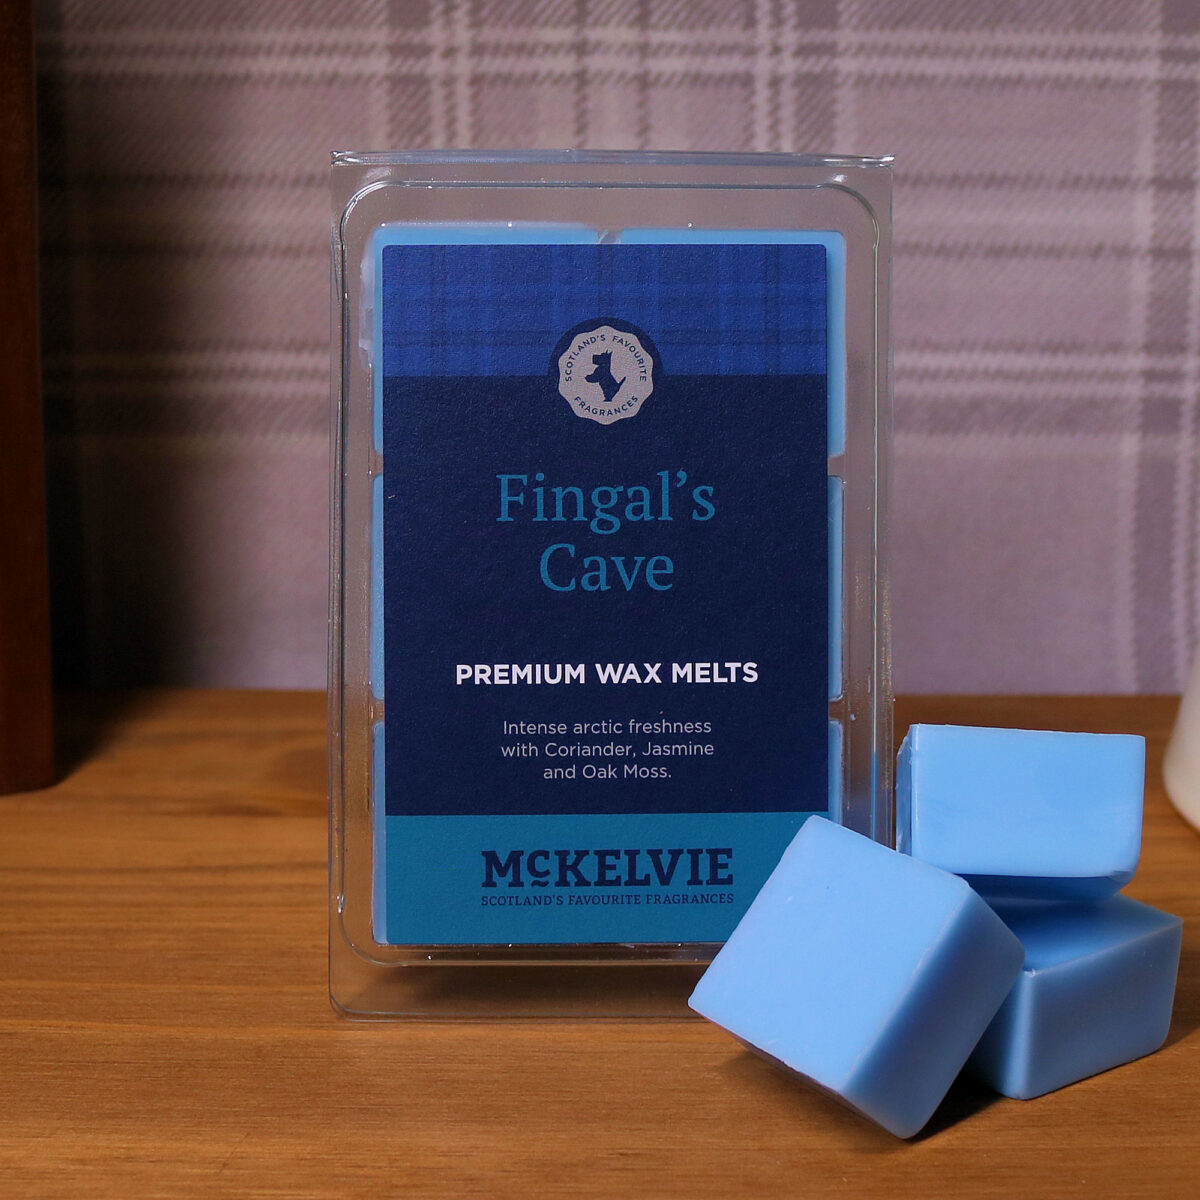 Fingal's Cave Wax Melts